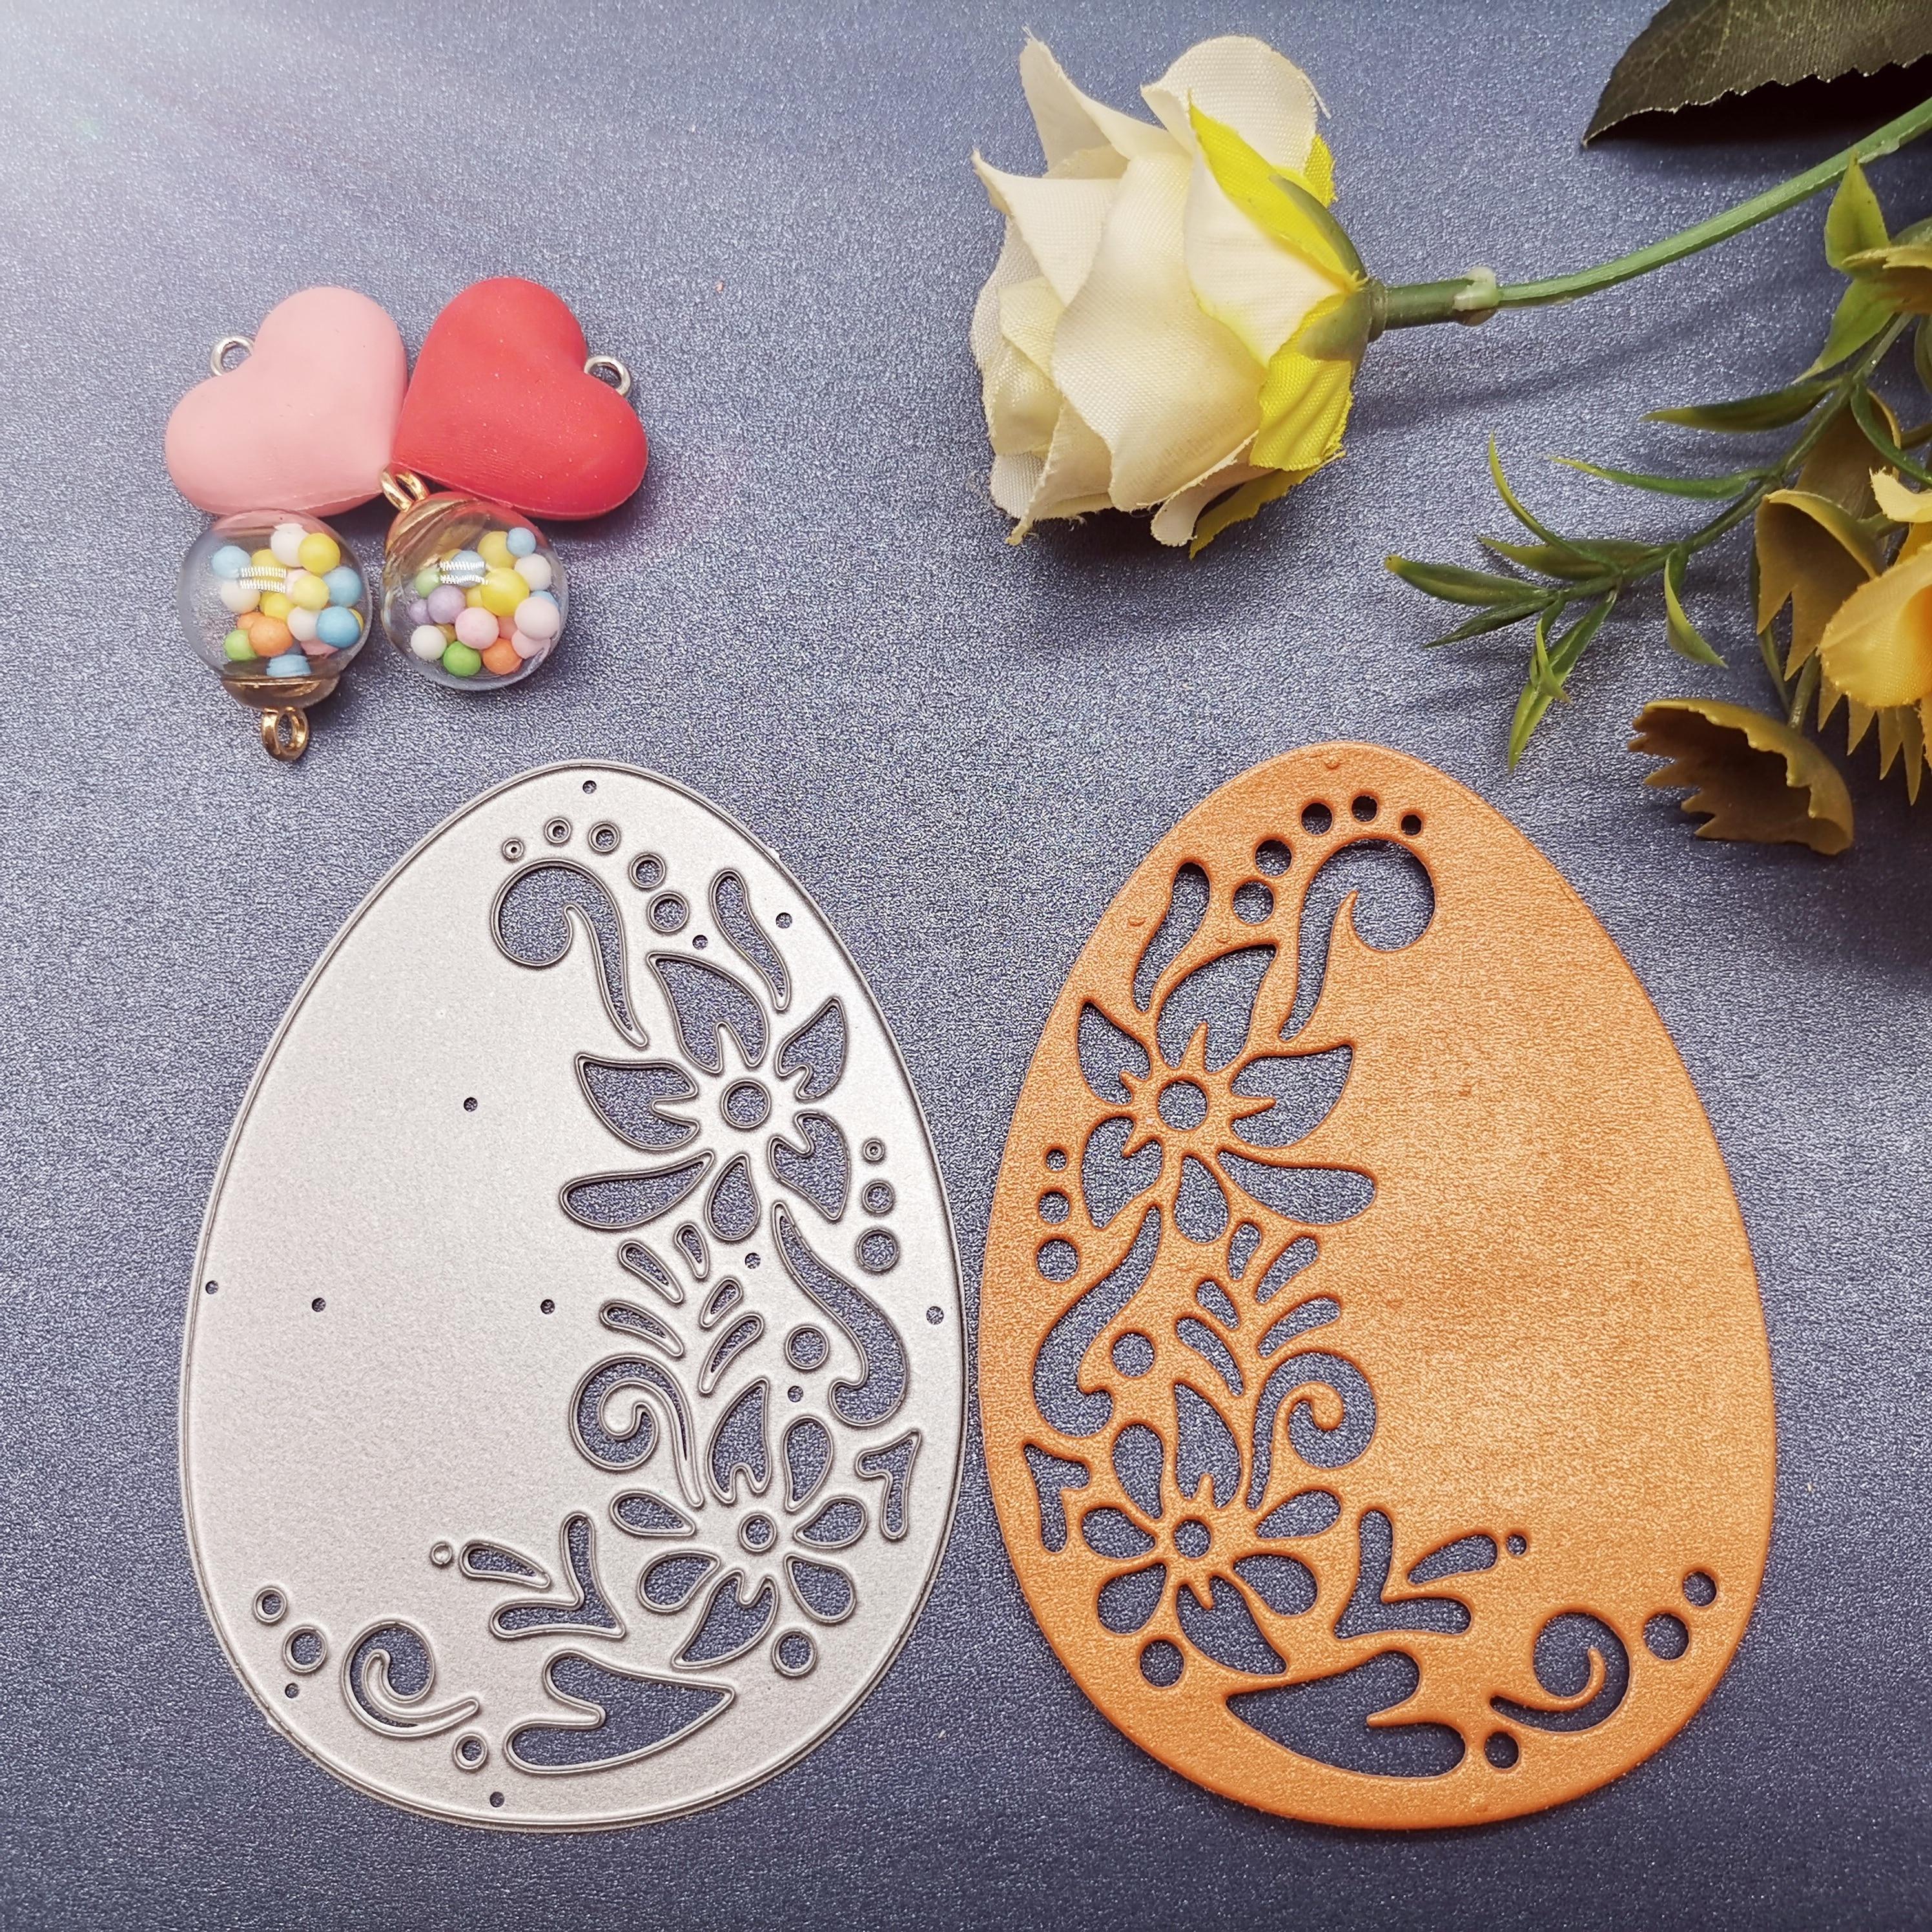 Cutting Dies  Easter Eggs DIY Scrap Booking Photo Album Embossing Paper Cards 66*88mm